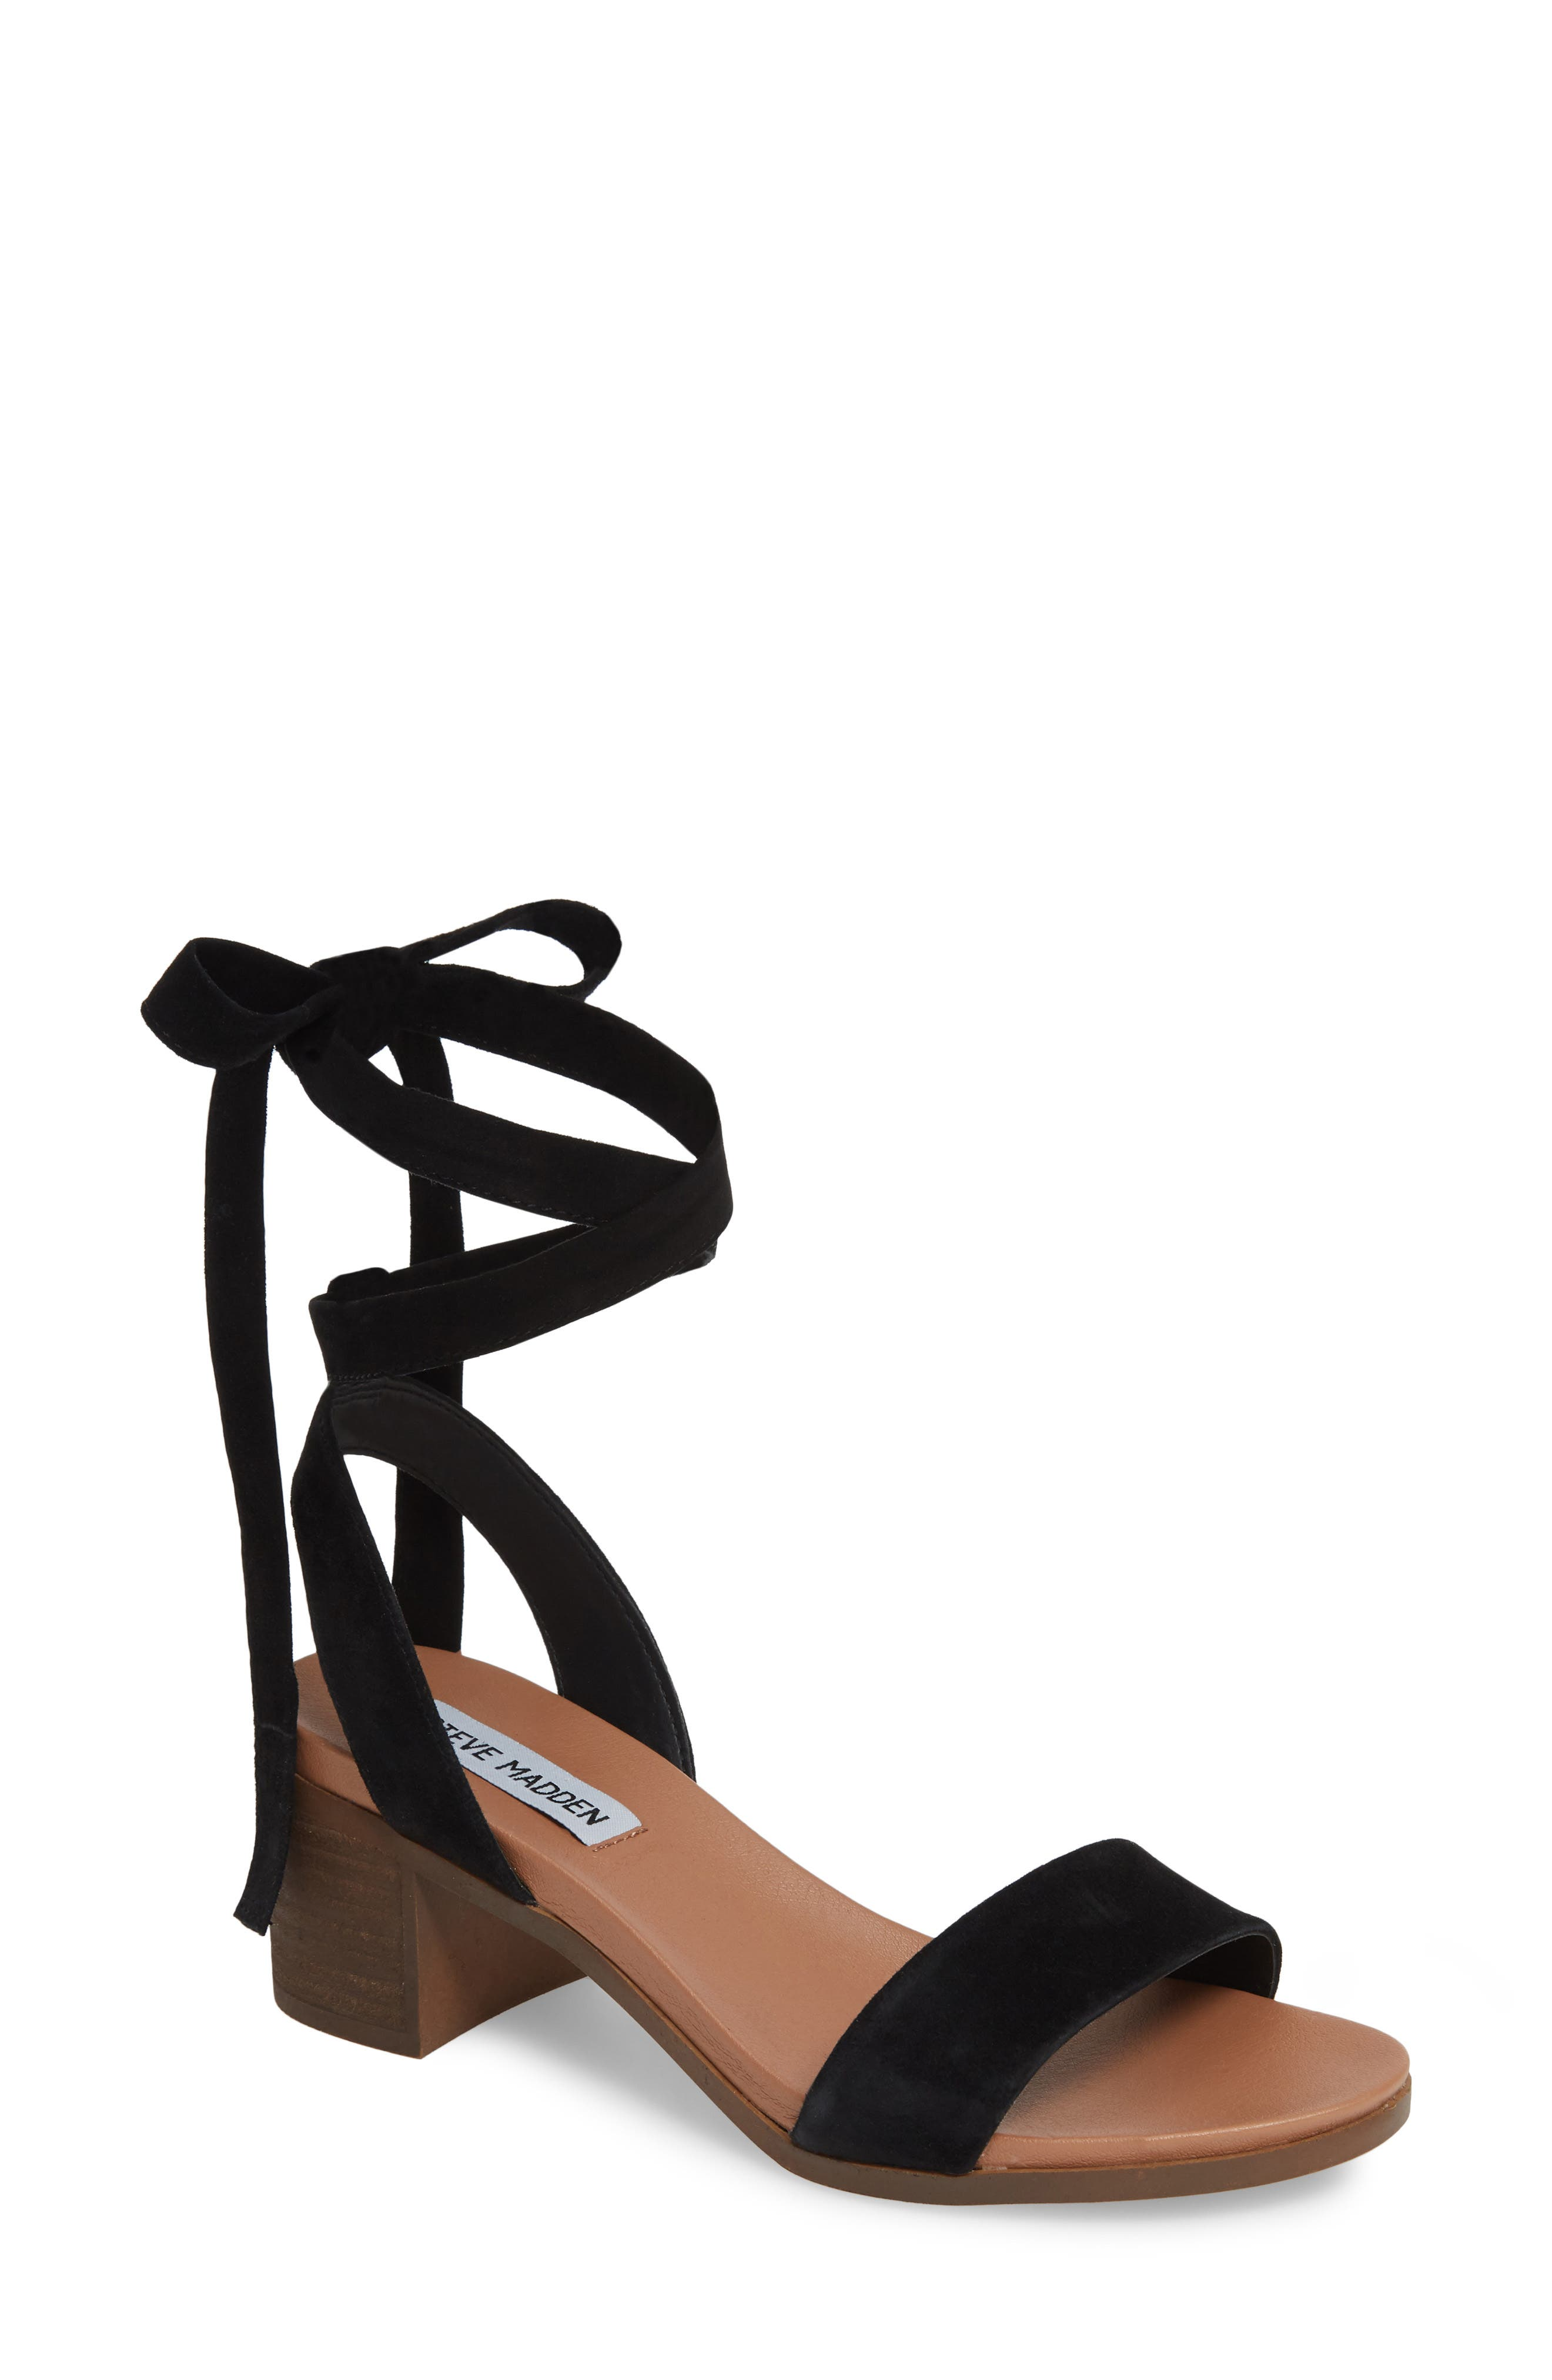 On sale Steve Madden Adrianne Ankle Wrap Sandal Women